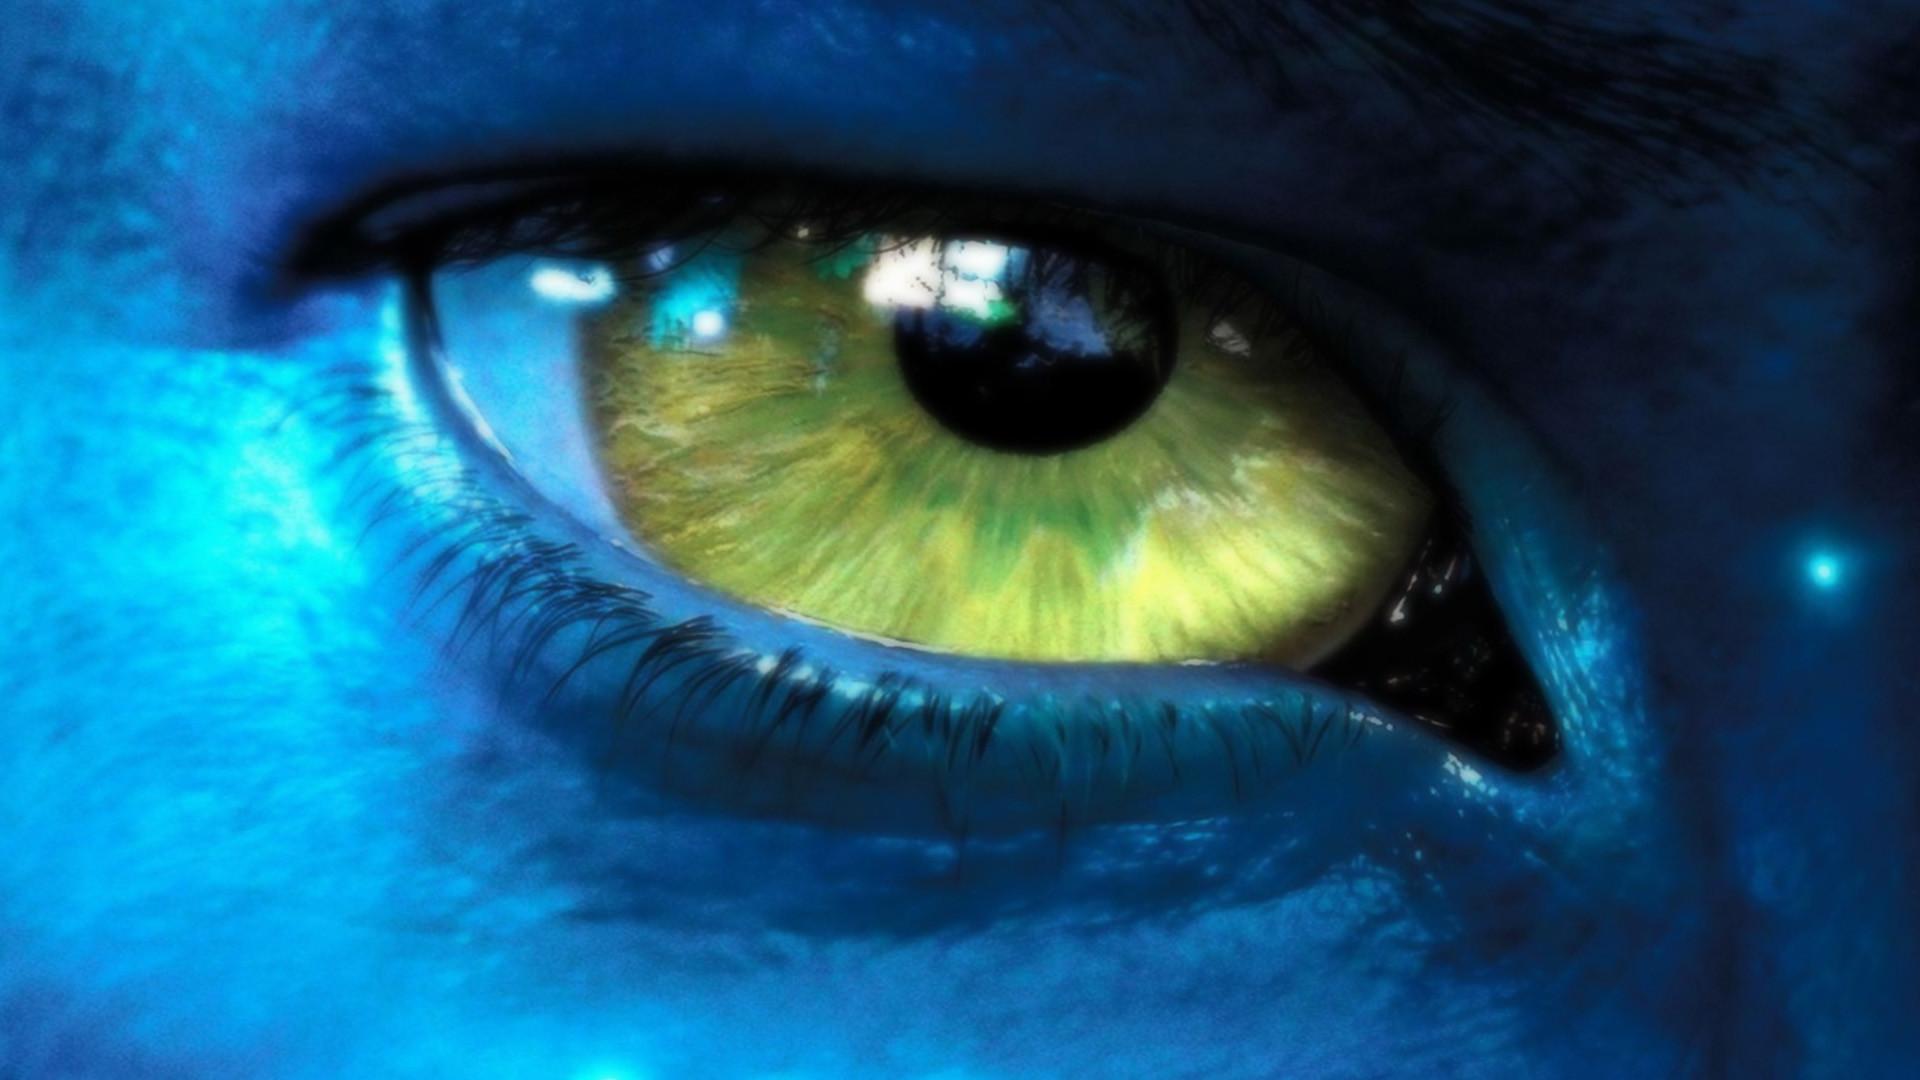 Avatar Movie Wallpapers Collection 6 (1920 x 1080 pixels) – Digital Citizen